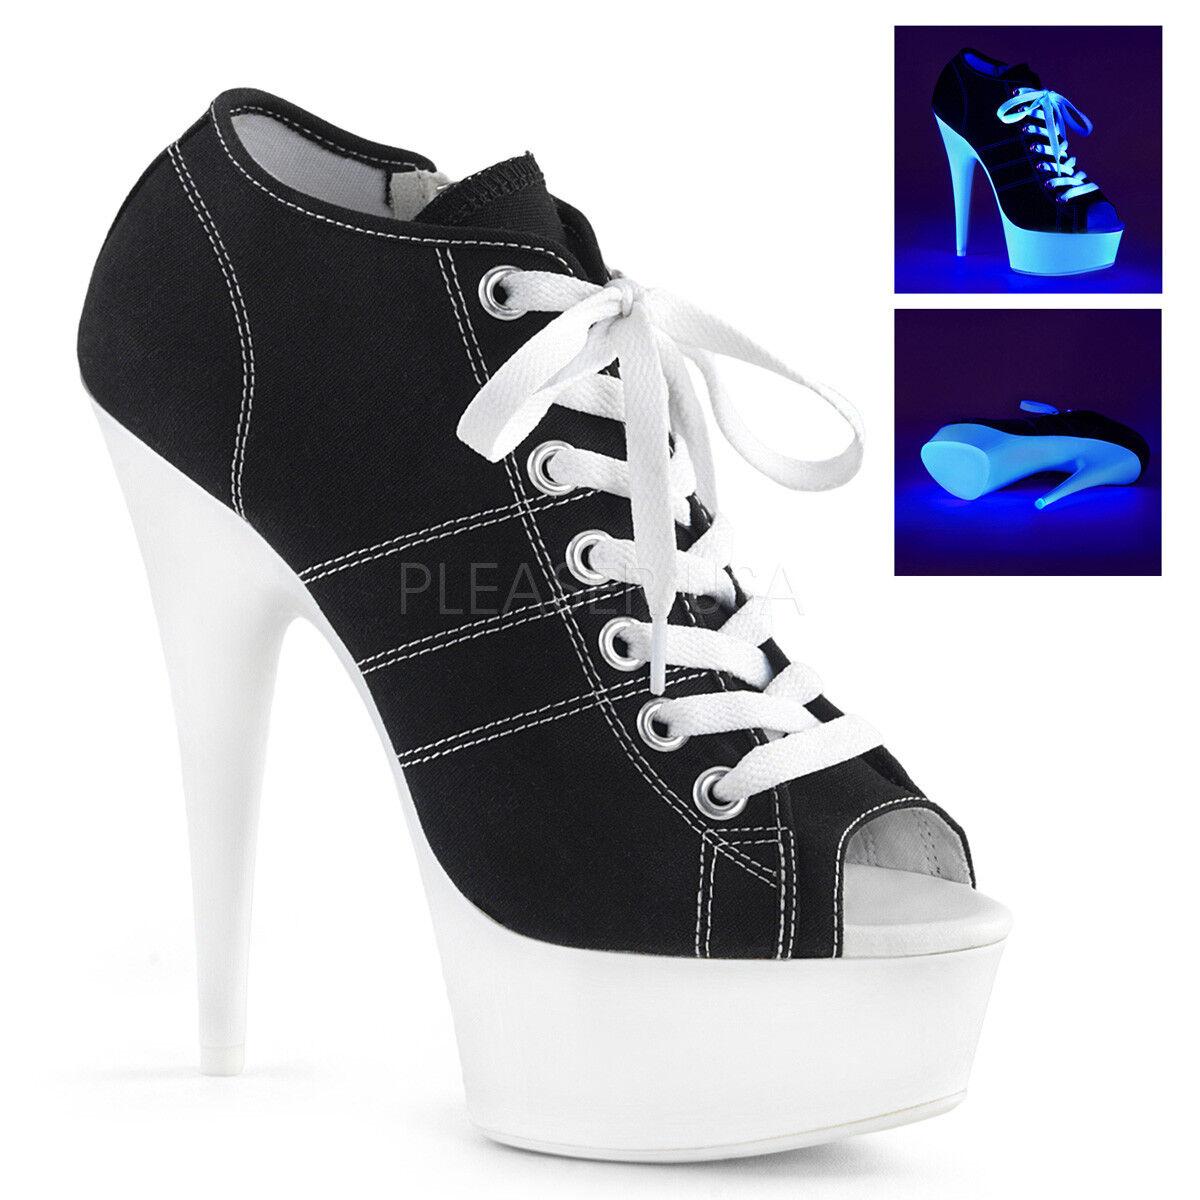 PLEASER Delight-600sk-01 Series 6  Heel Sexy Exotic Platform Platform Platform shoes 62a1bd